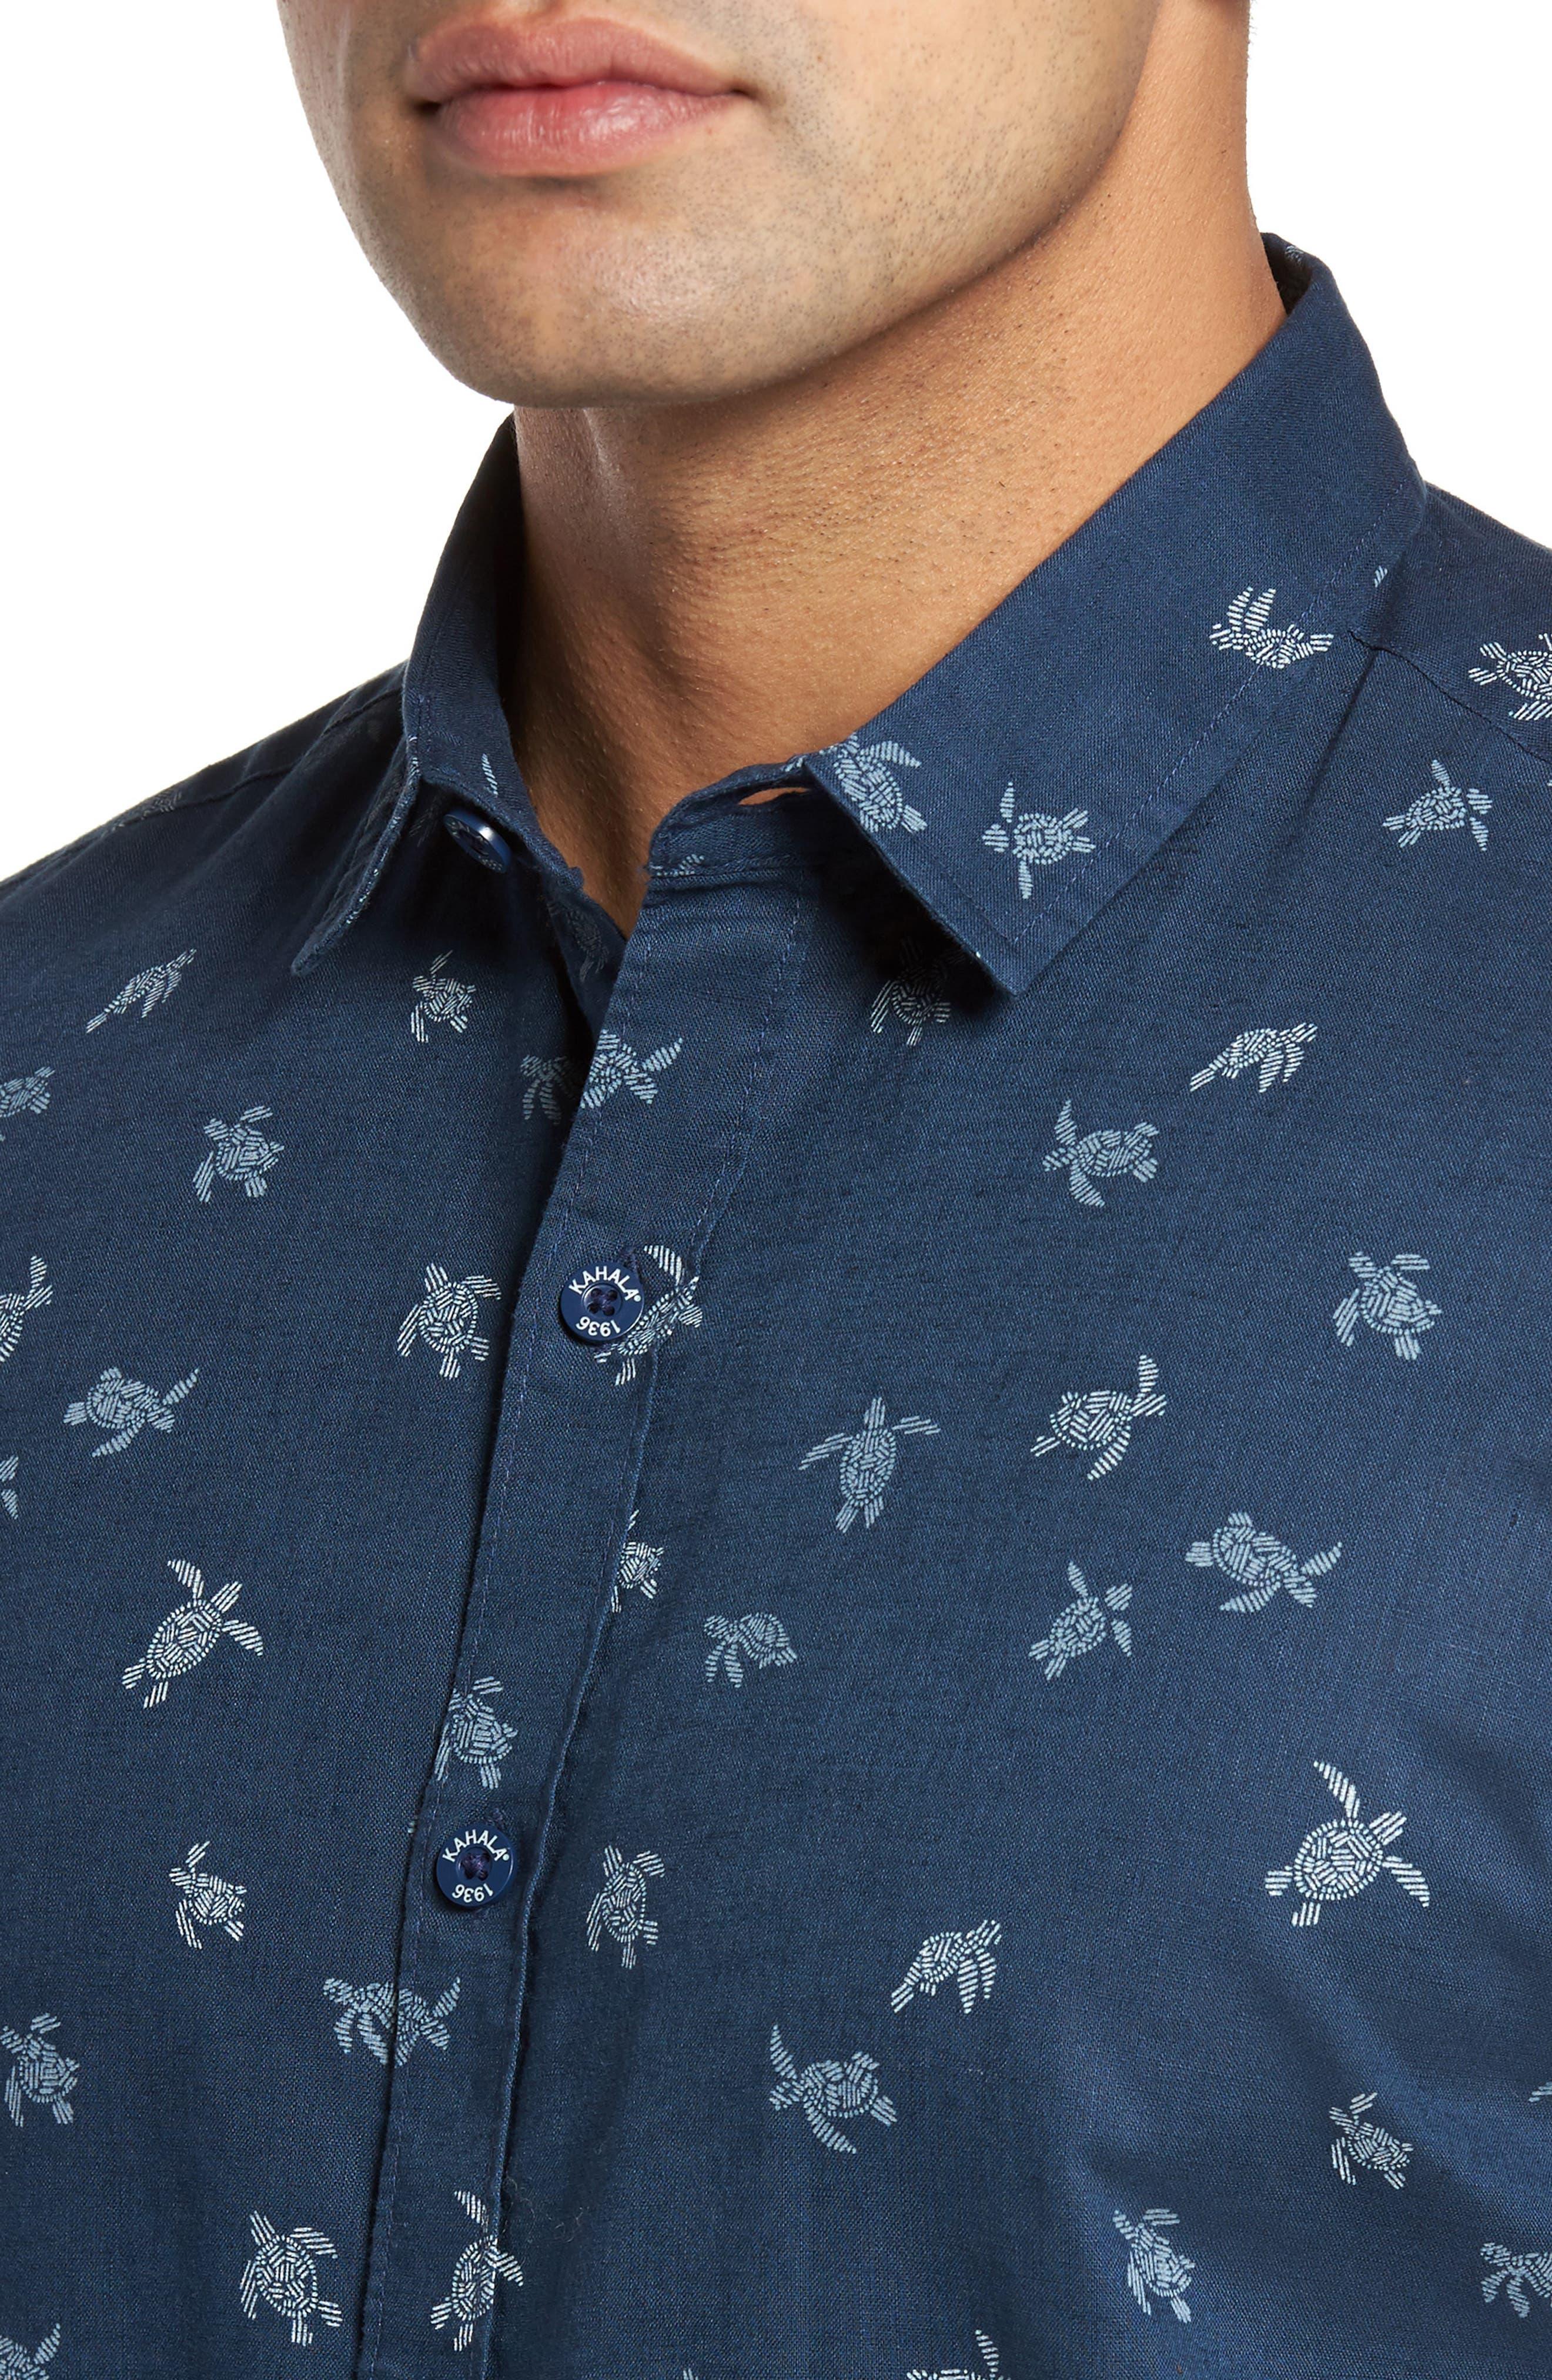 Honu La Hanai Trim Fit Print Sport Shirt,                             Alternate thumbnail 4, color,                             Navy